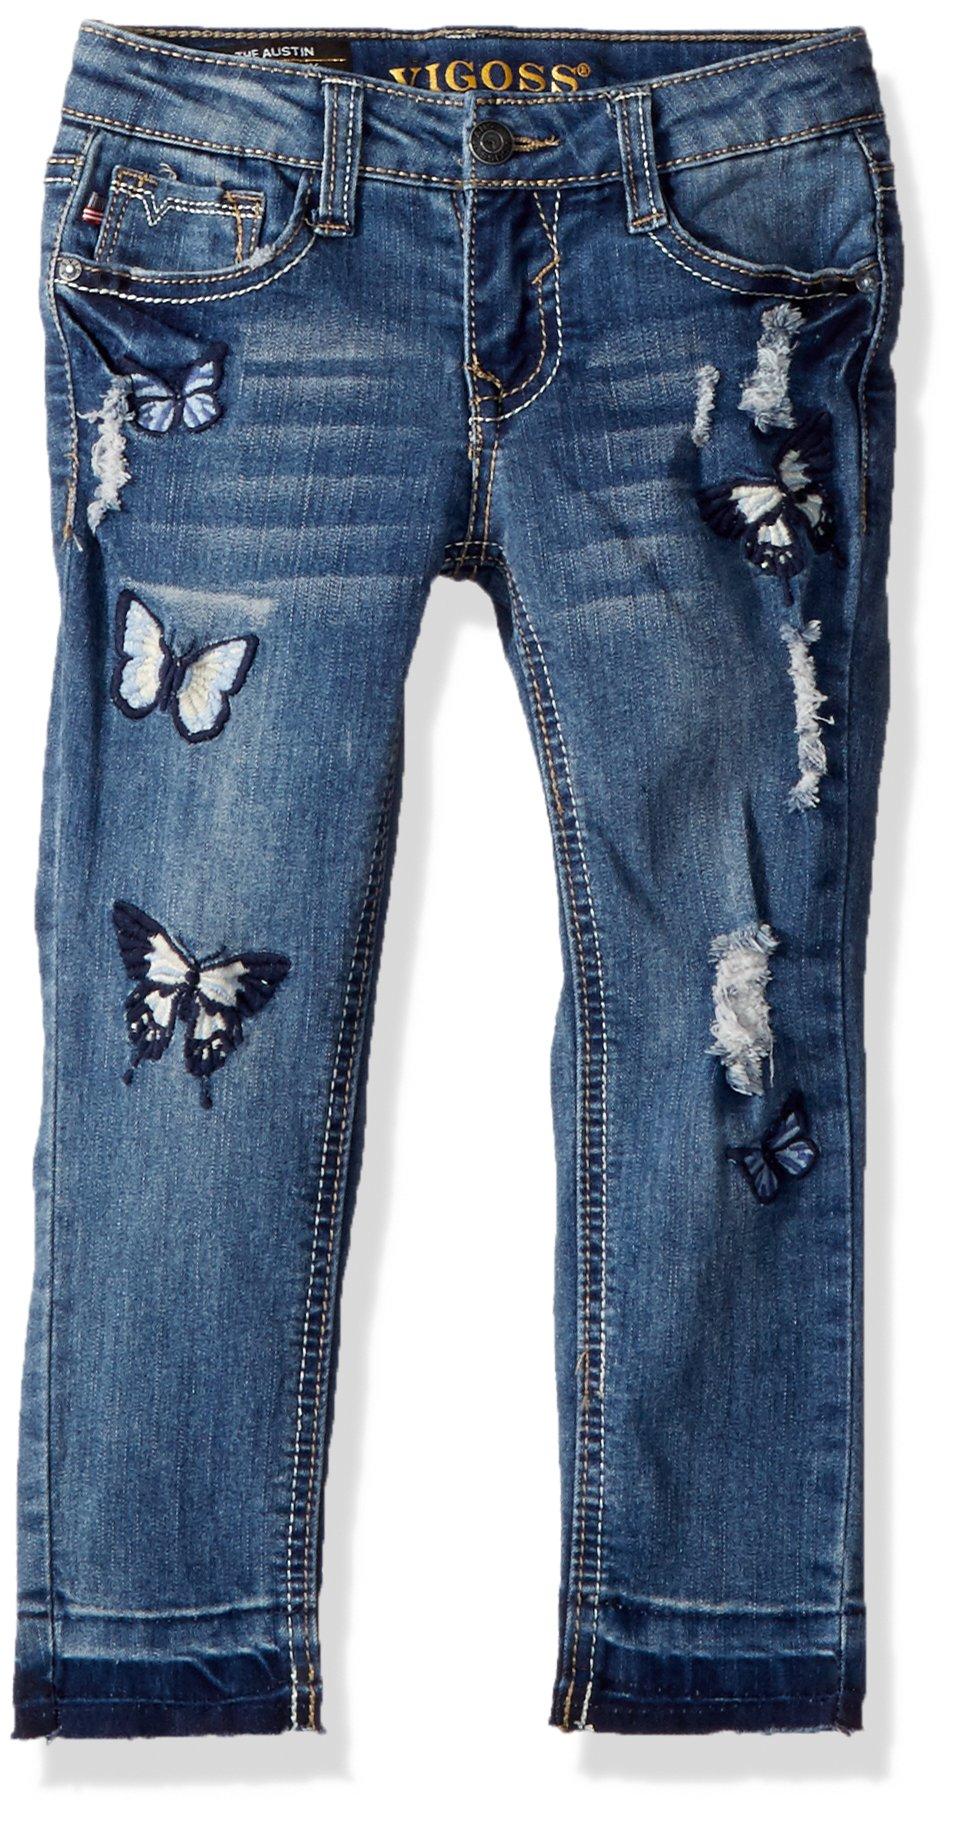 VIGOSS Little Girls' Fashion Jean, Freezer Blue, 4